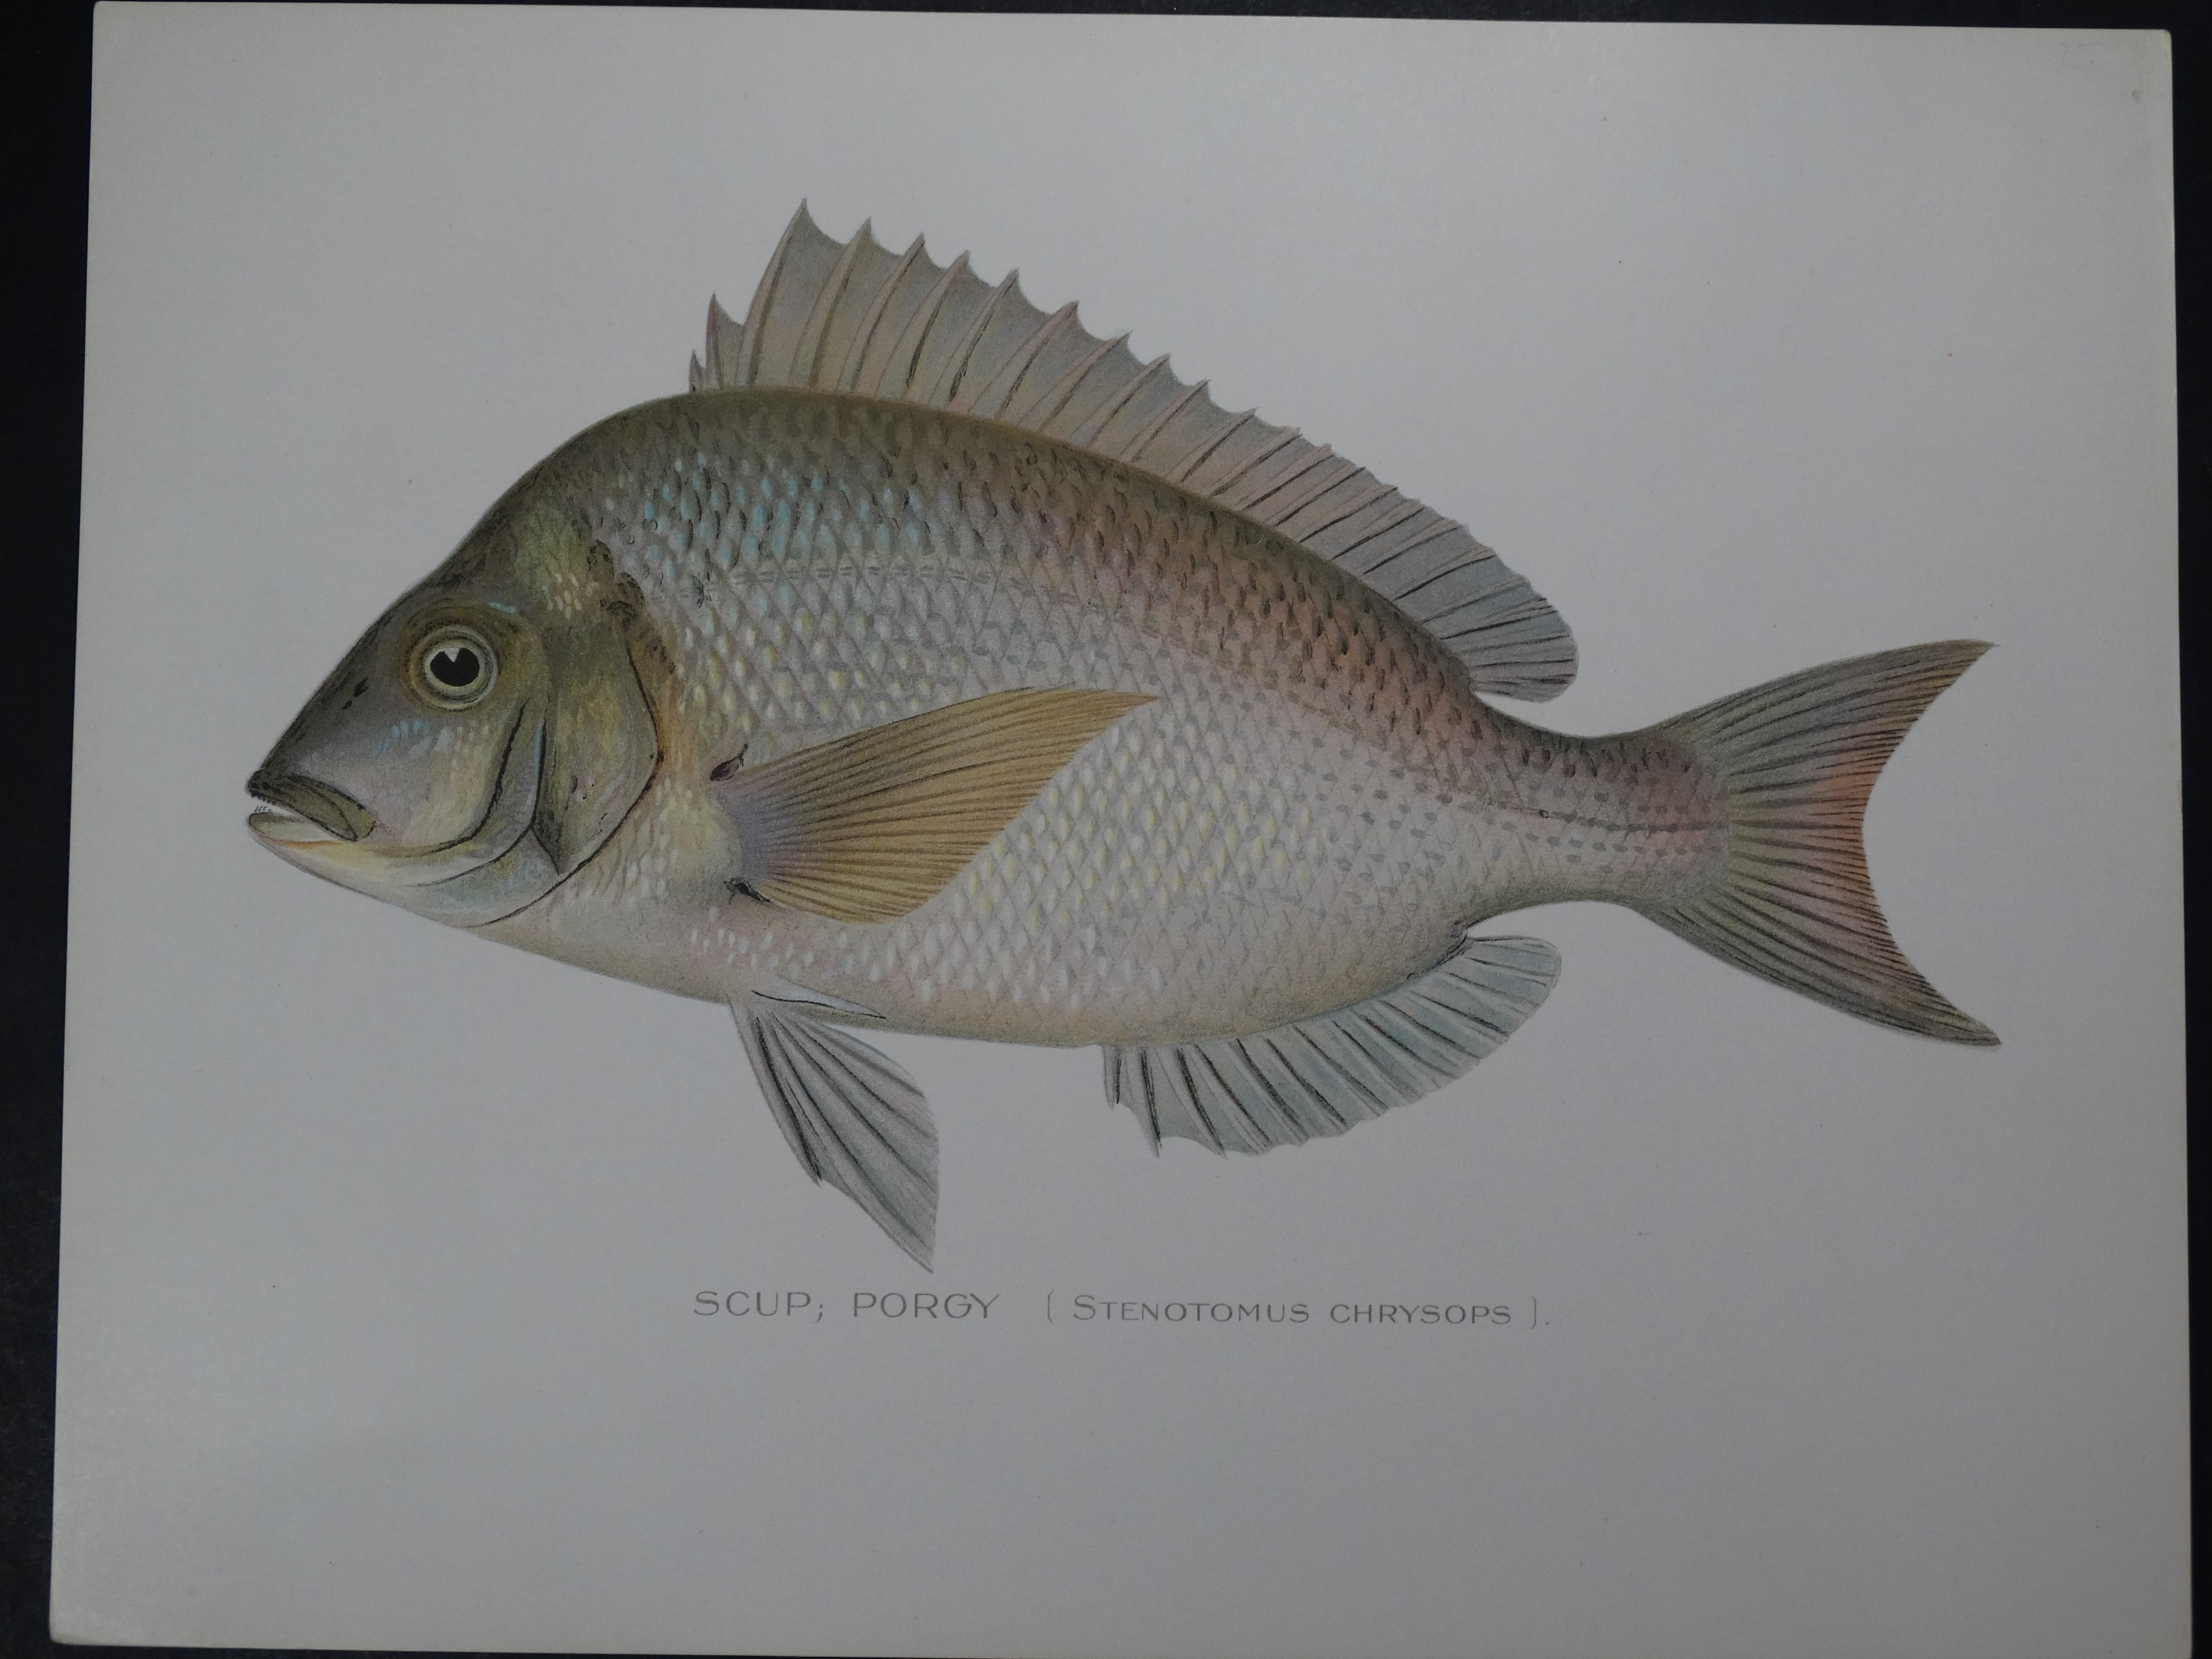 Denton Fish Print of Scup Porgy